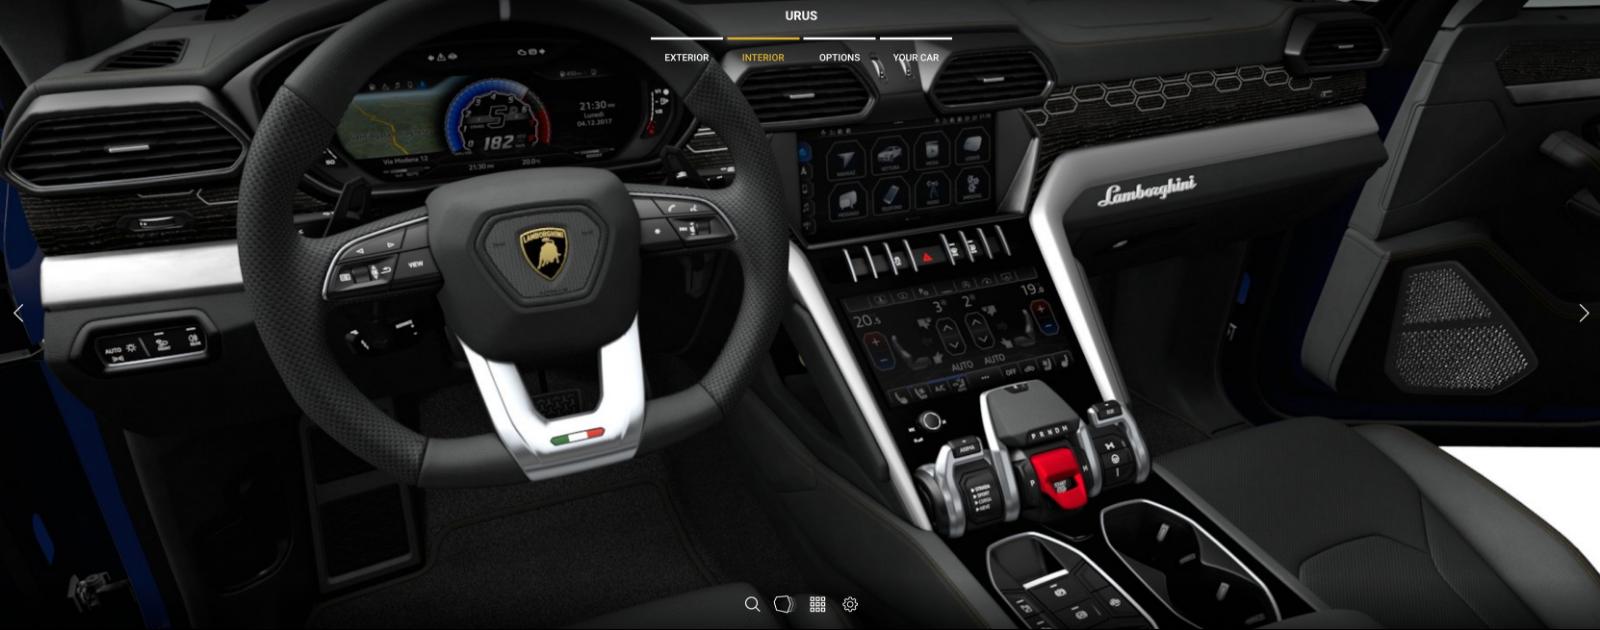 Amazing 2019 Lamborghini Urus PURCHASING OCT '18 DELIVERY SLOT NOT VEHICLE  – SEE ITEM DESCRIPTION 2018-2019